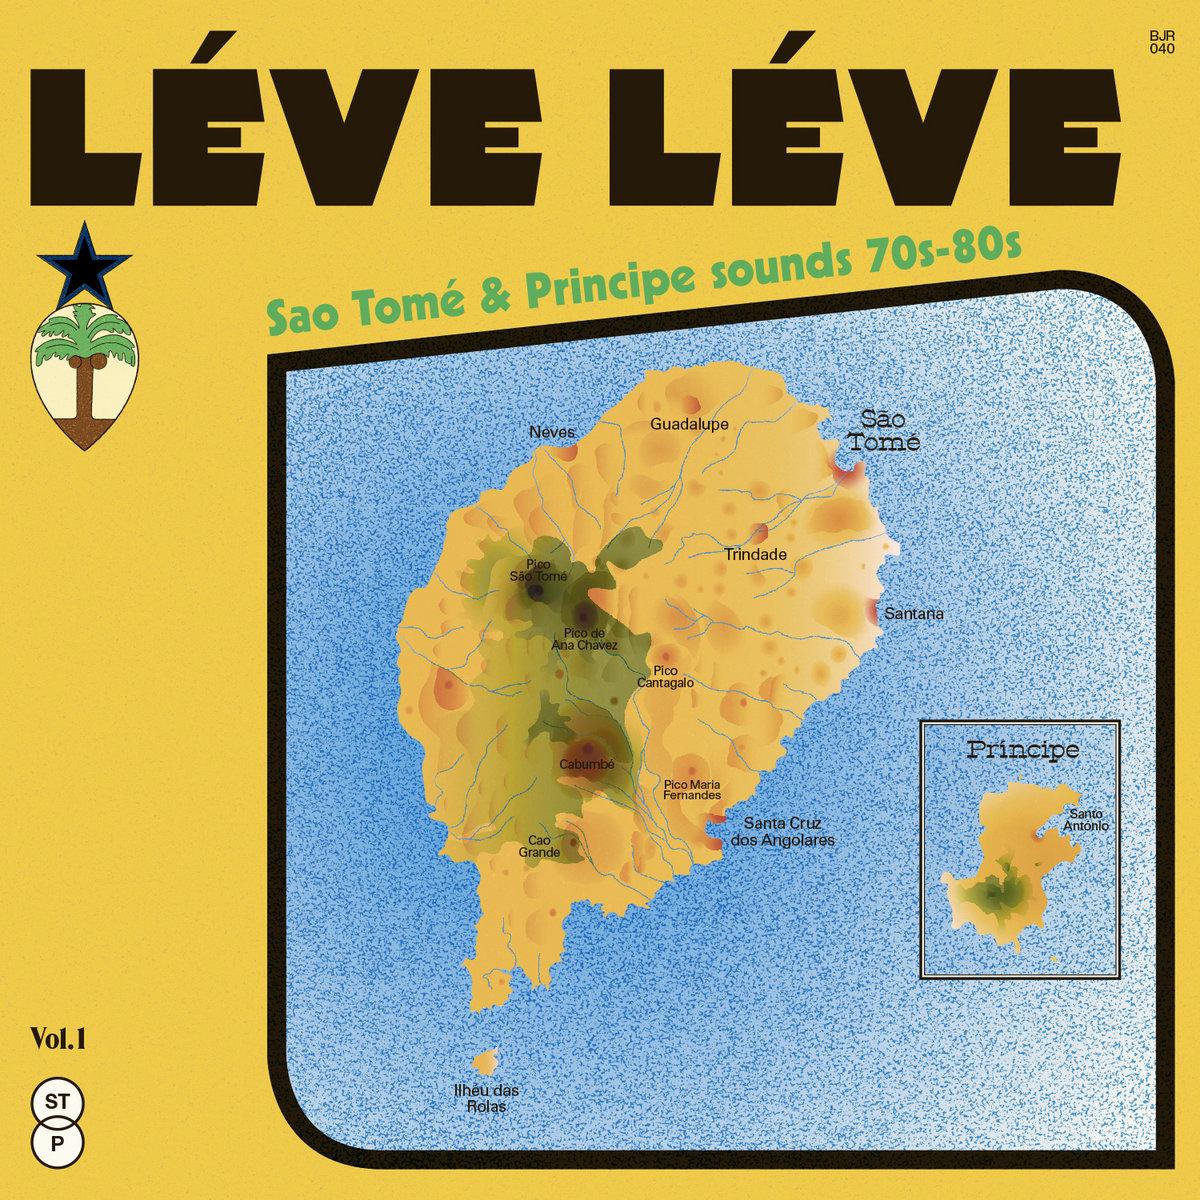 LÉVE LÉVE Sao Tomé & Principe sounds 70s-80s